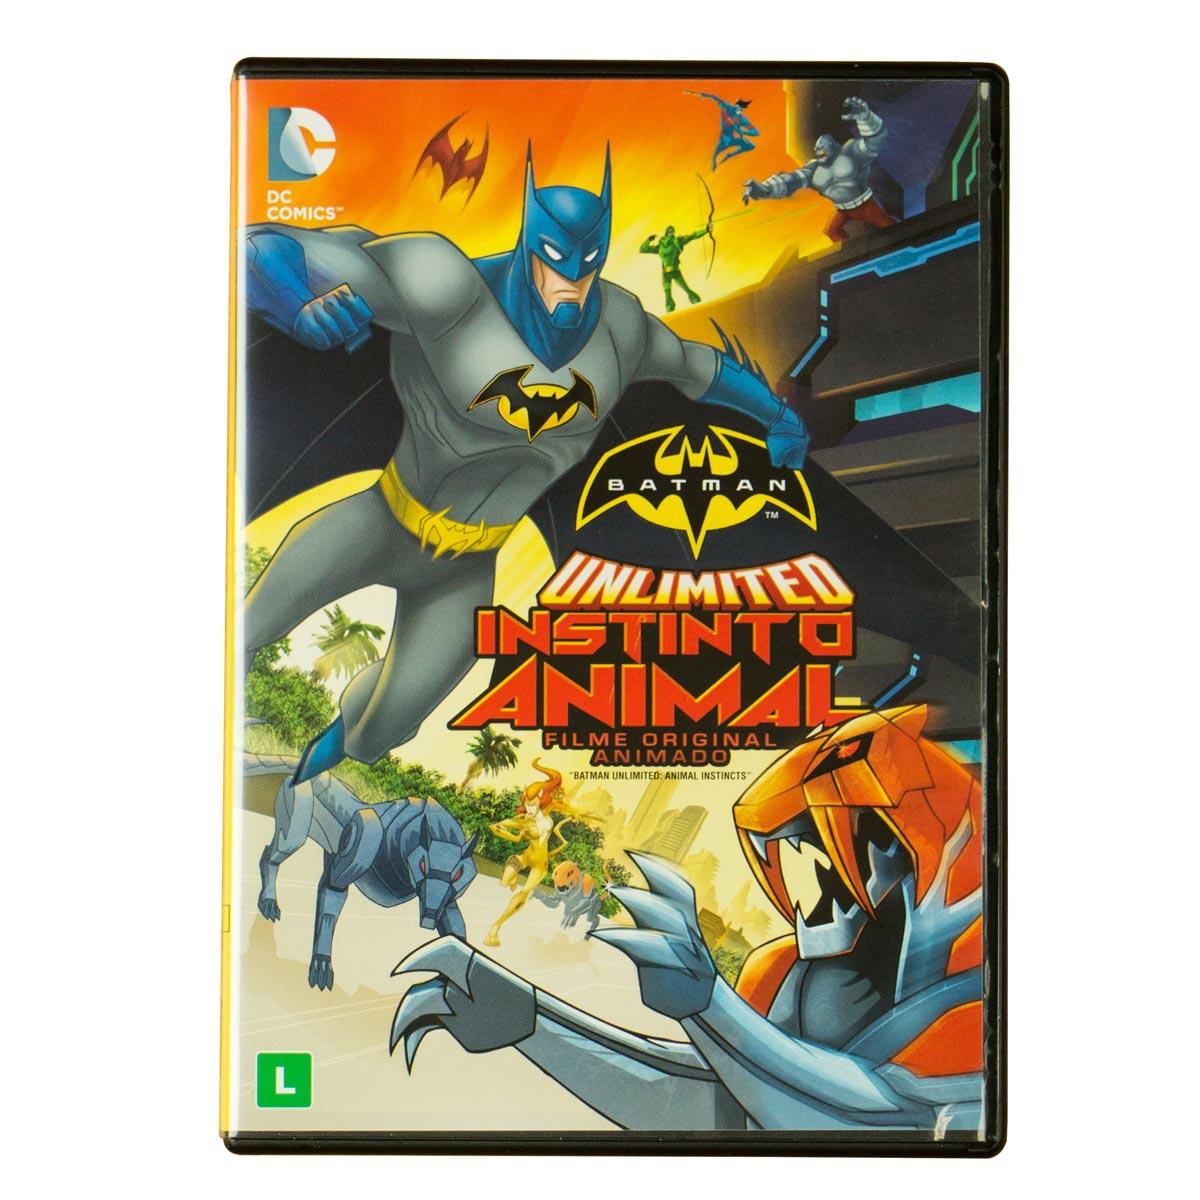 DVD Batman Unlimited Instinto Animal